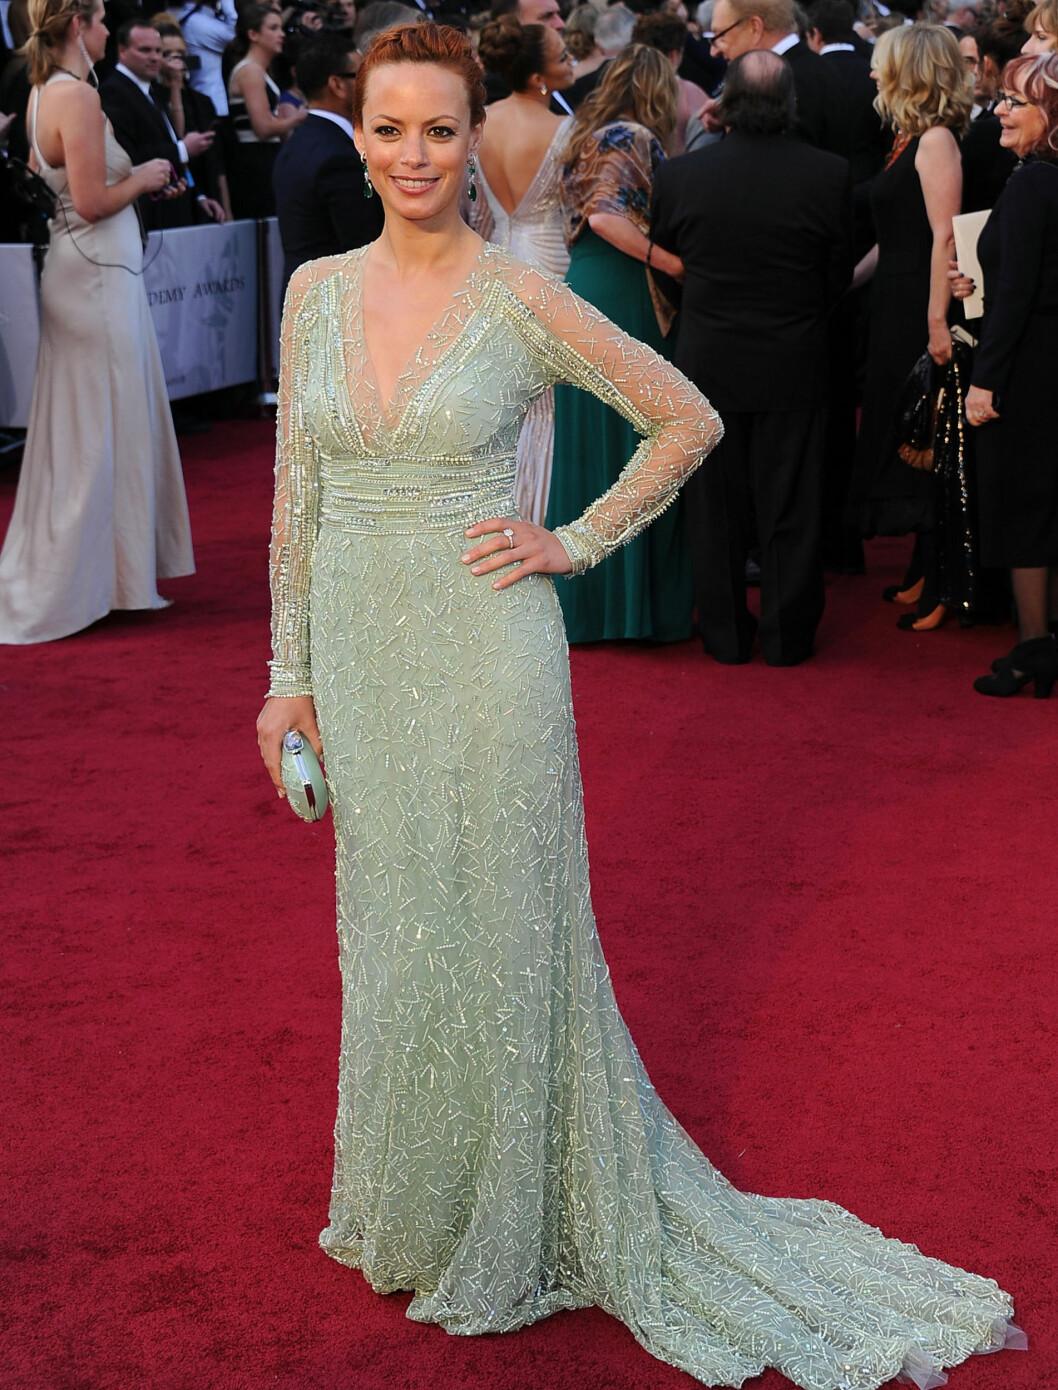 IKKE FIN: Berenice Bejo gikk også for mintgrønt, men Elie Saab-kjolen var langt fra flatterende på stjernen.  Foto: All Over Press